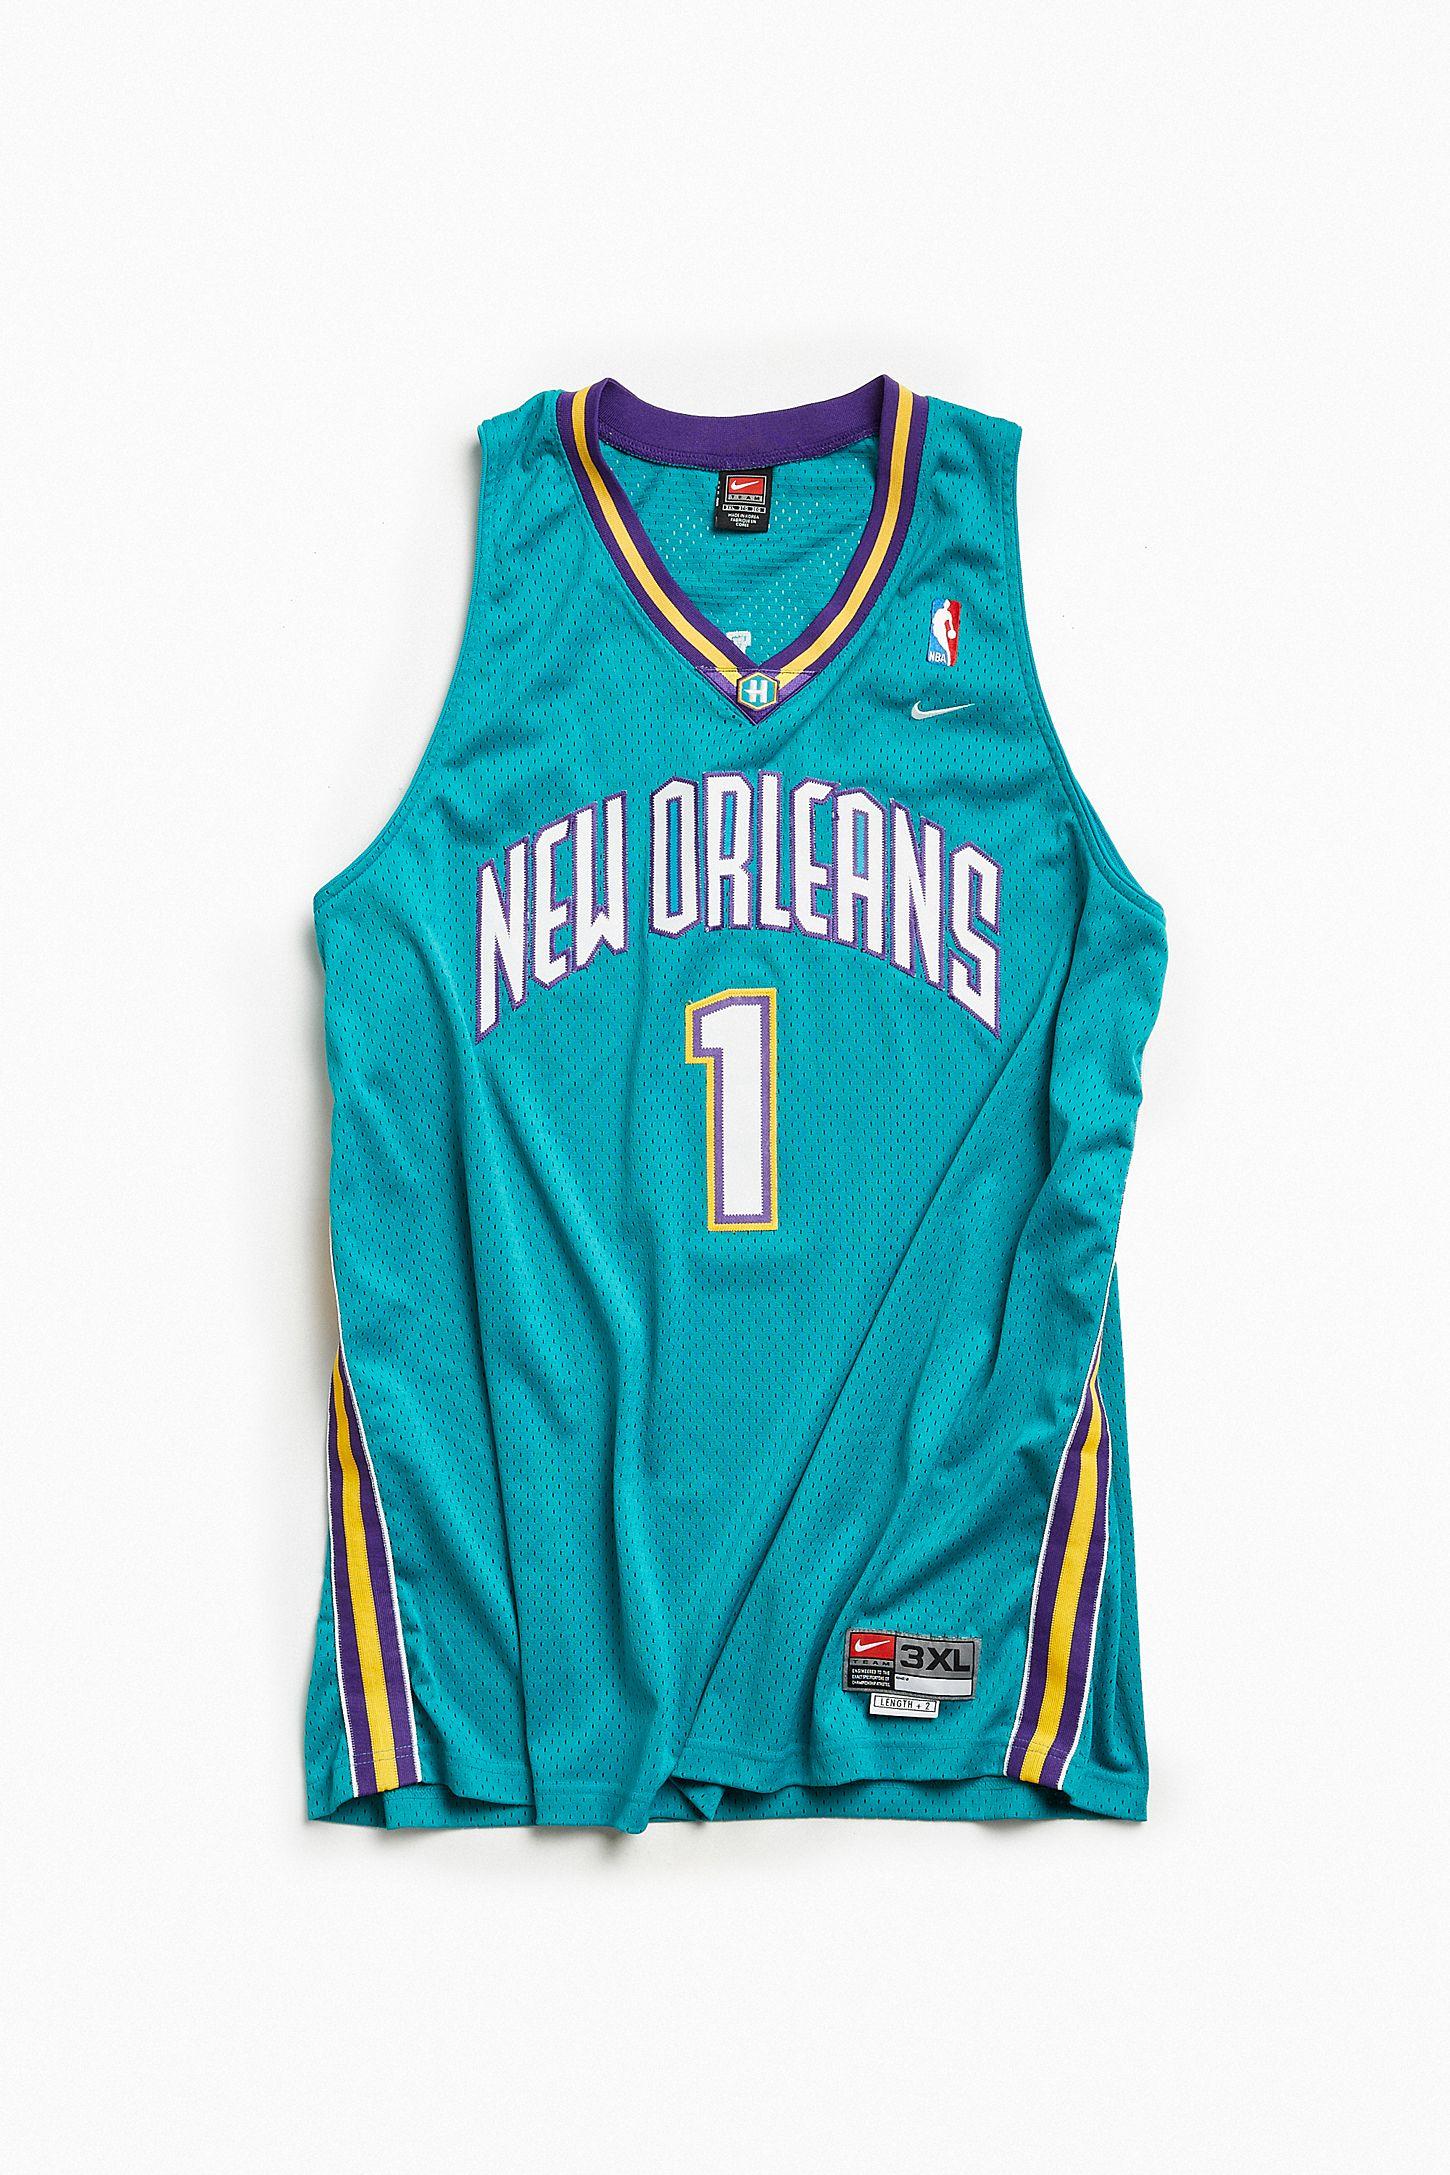 Vintage NBA New Orleans Hornets Baron Davis Basketball Jersey ... 11dafd3e7